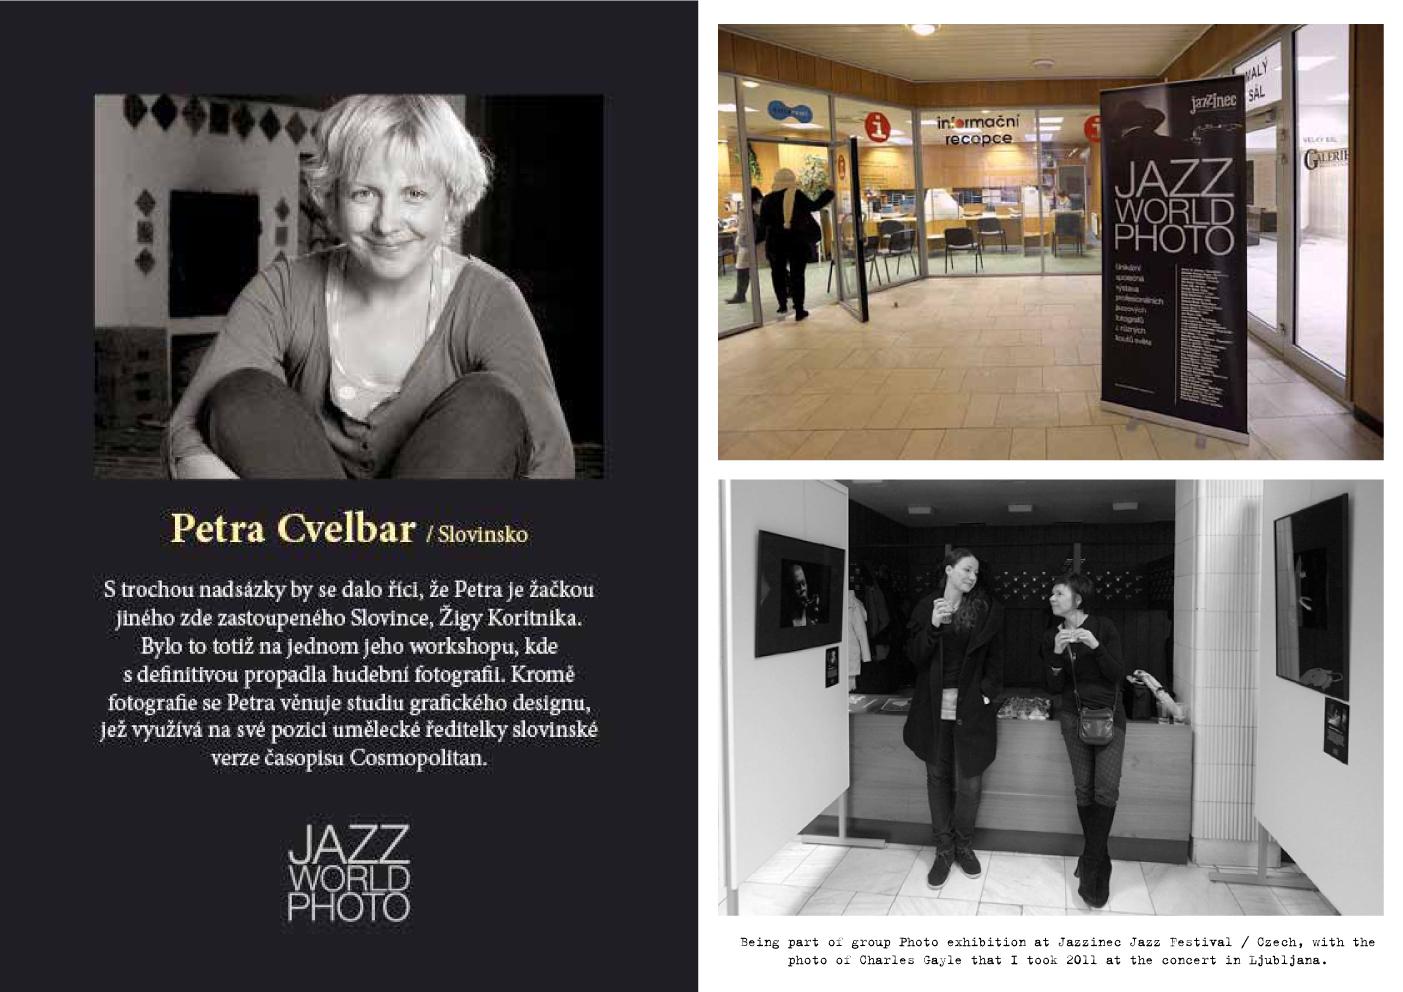 Group Photo Exhibition at Jazzinec Jazz Festival / Czech